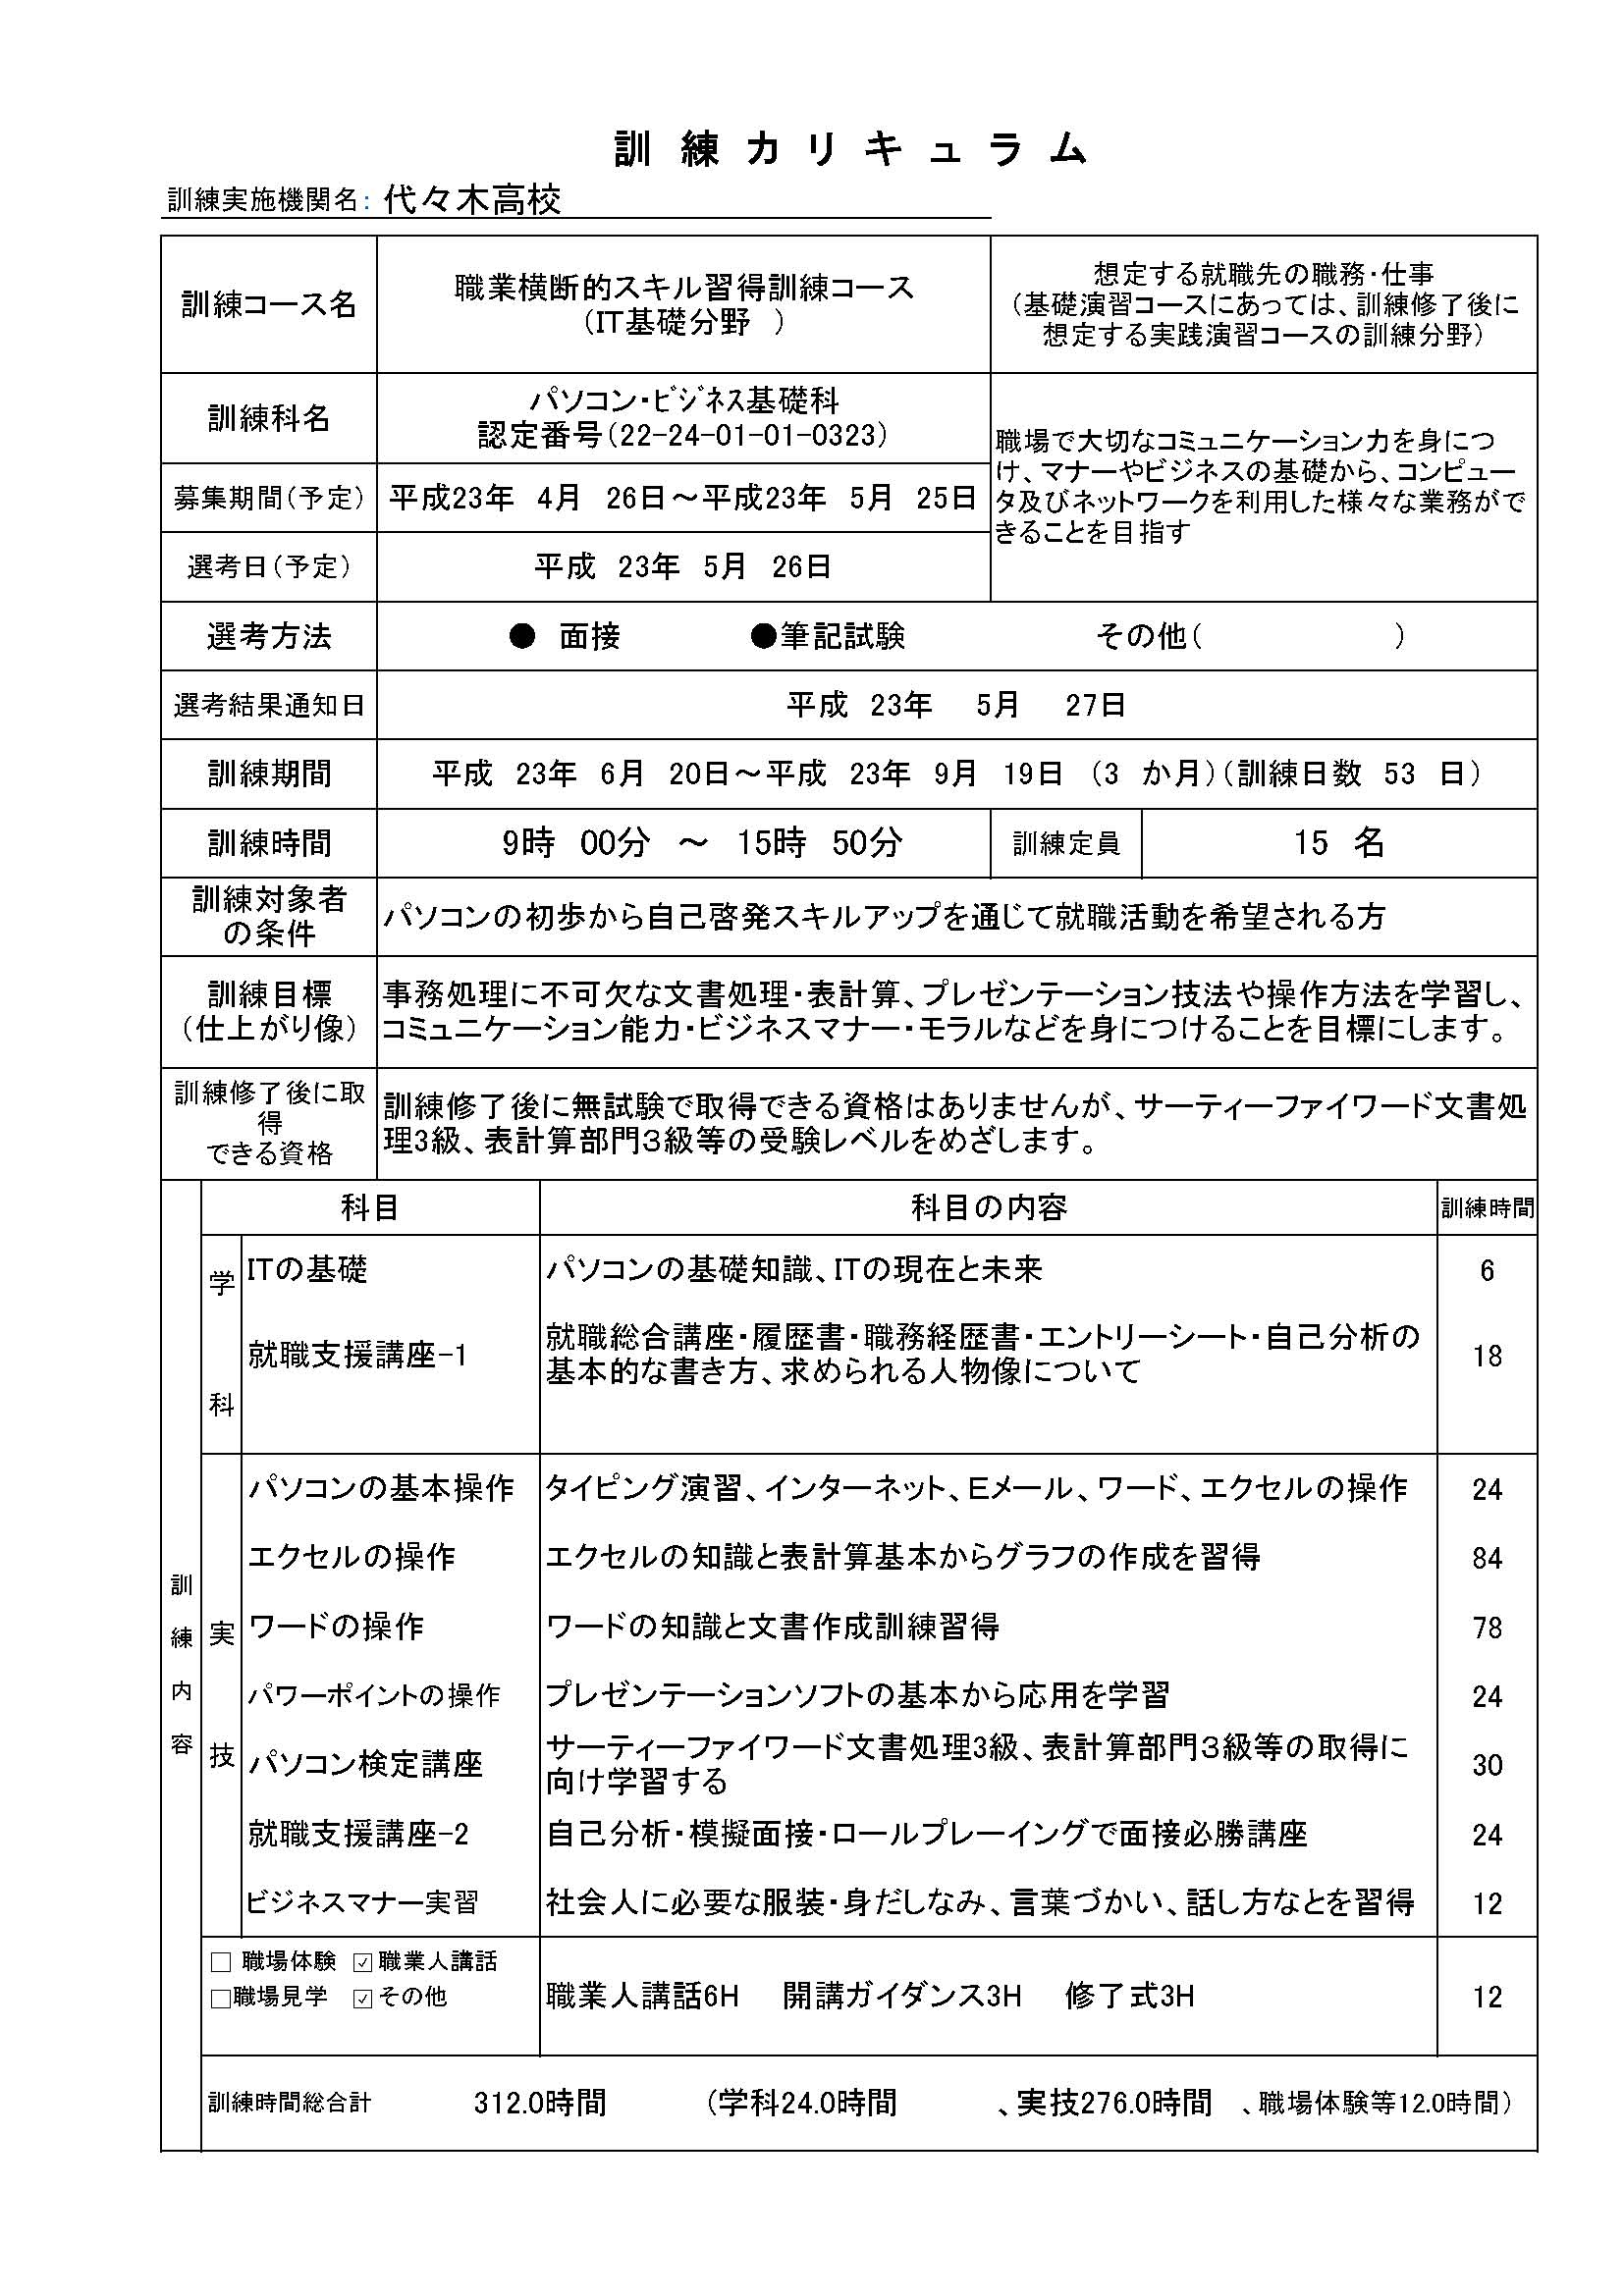 http://iseshima.org/%E3%83%91%E3%82%BD%E3%82%B3%E3%83%B3%E3%83%91%E3%83%B3%E3%83%952_%E3%83%9A%E3%83%BC%E3%82%B8_2.jpg